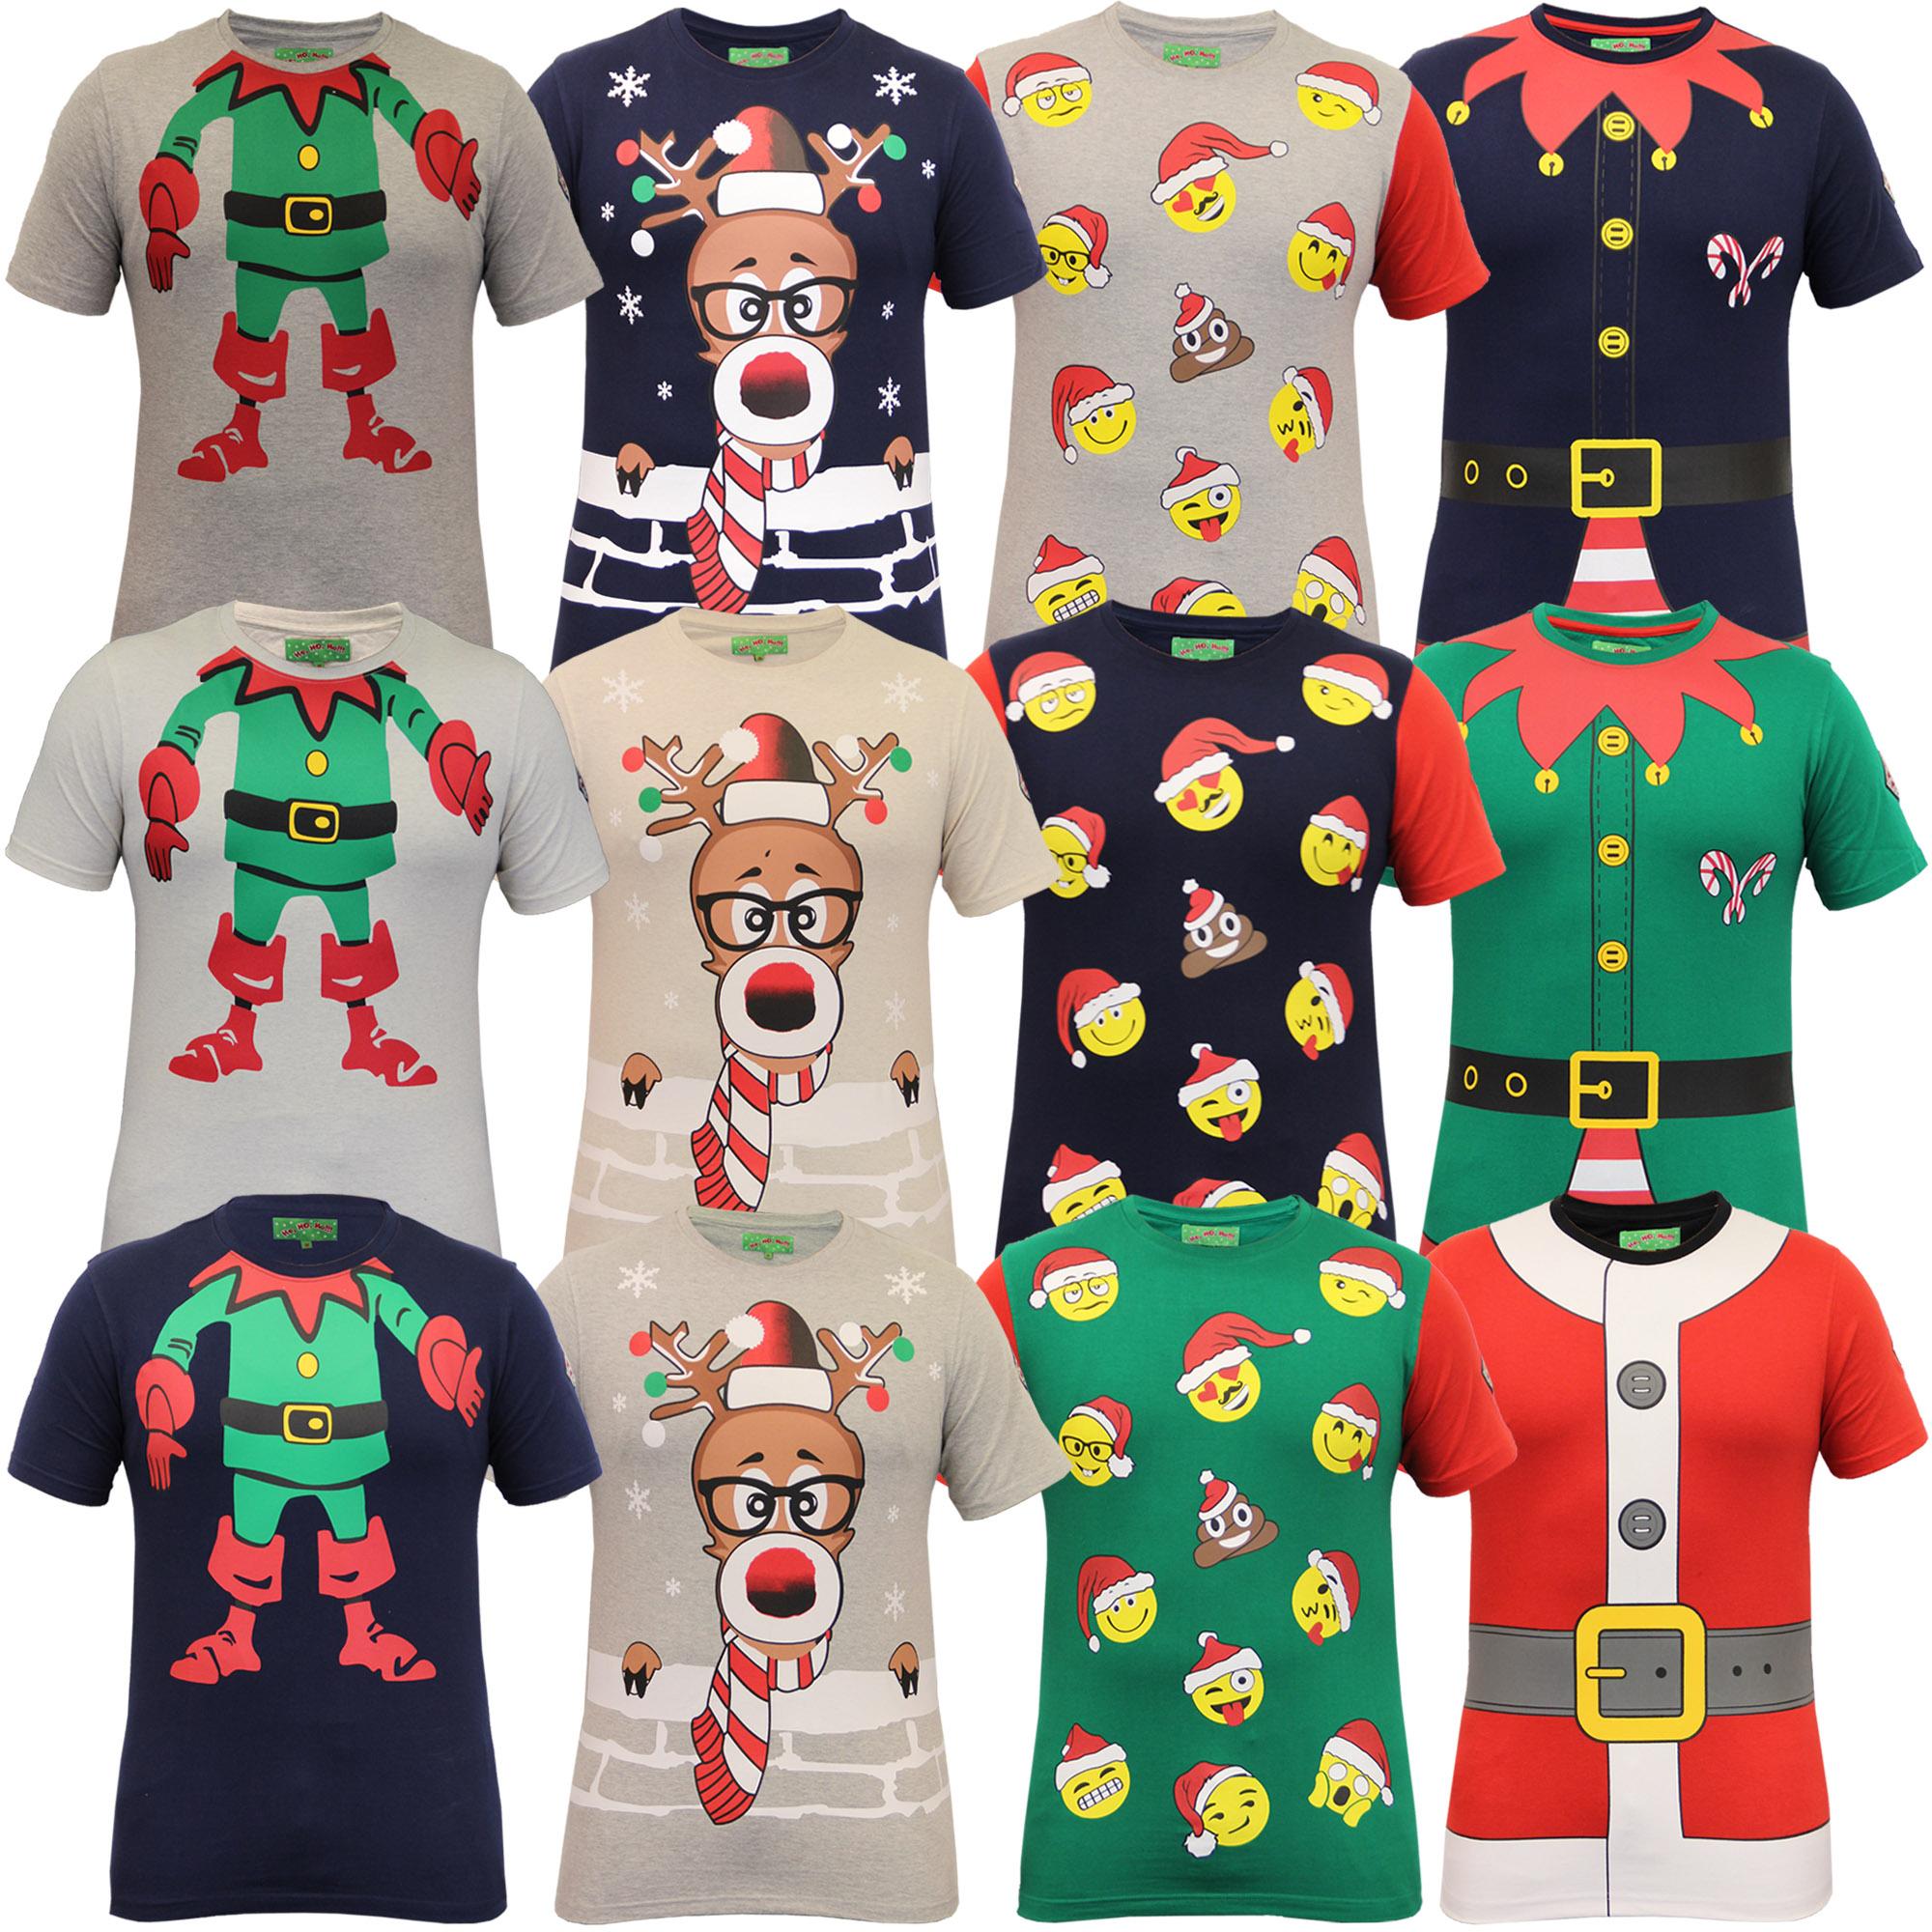 Christmas Shirt.Details About Mens Christmas T Shirt Ho Ho Ho Xmas Emoji Santa Claus Elf Reindeer Novelty Top